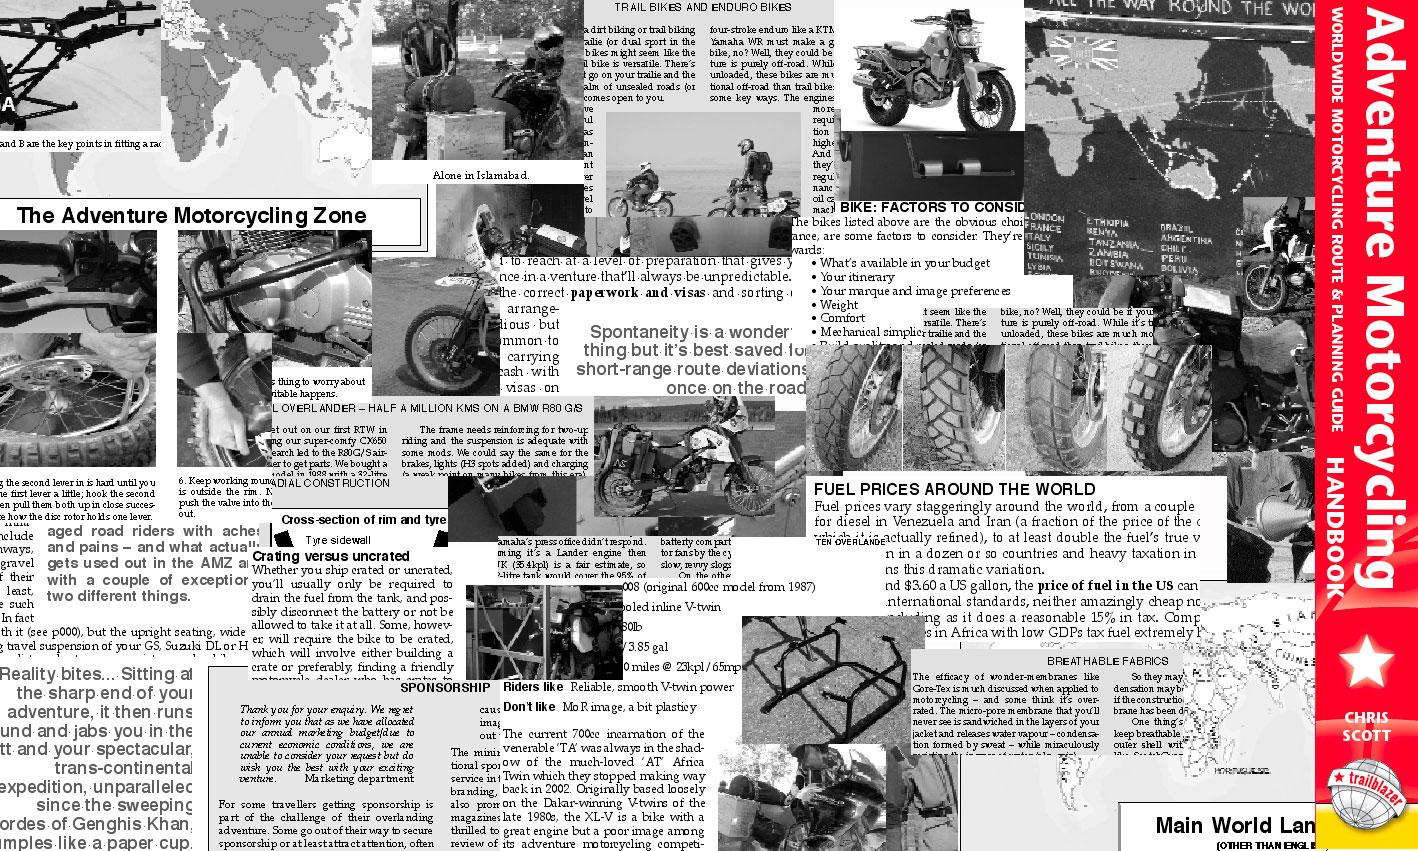 http://adventuremotorcyclinghandbook.files.wordpress.com/2011/12/snapshot.jpg